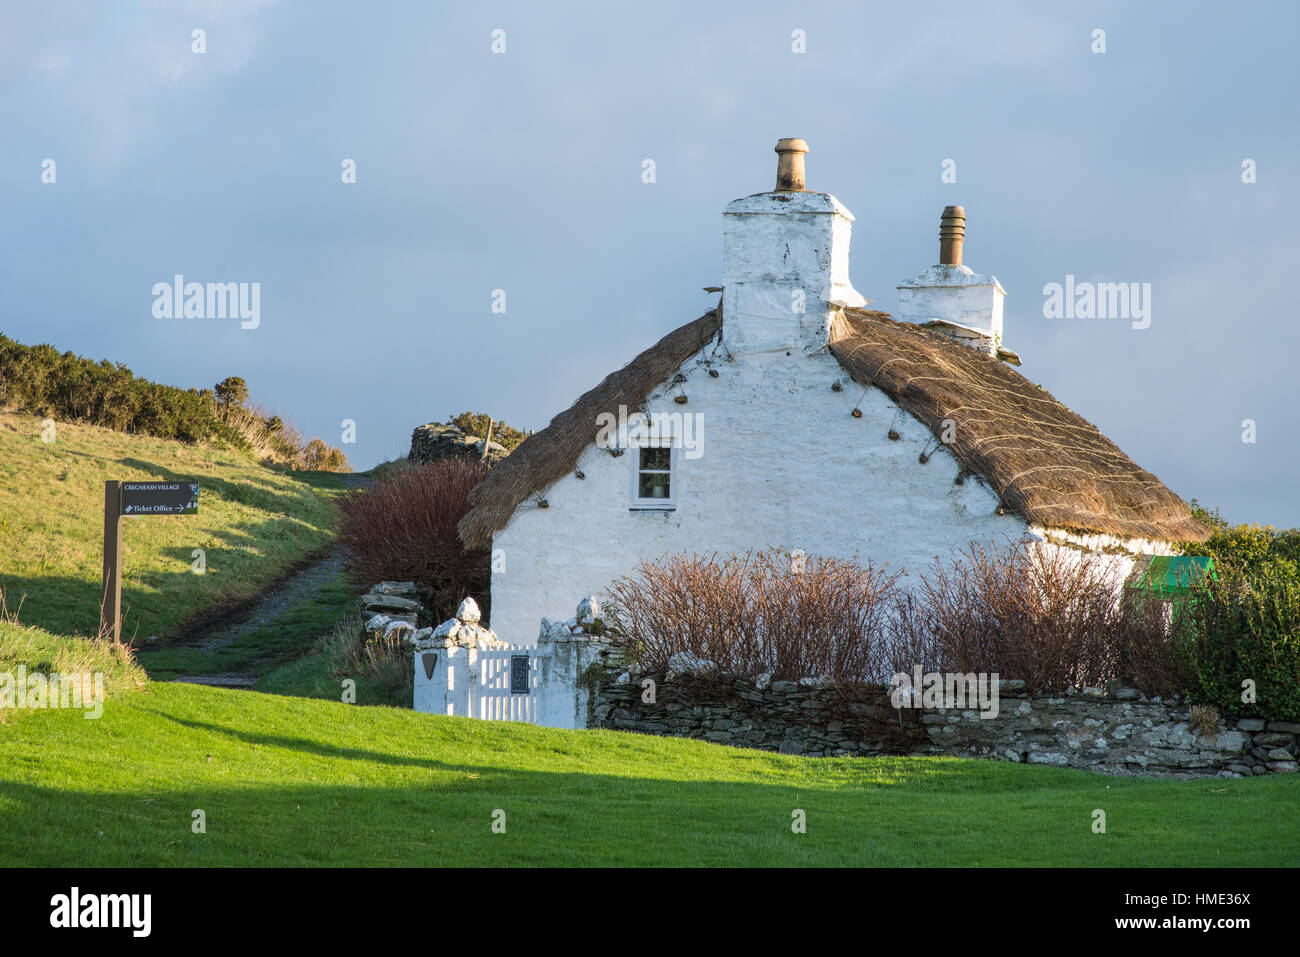 Manx cottage at Cregneash, Isle of Man. - Stock Image